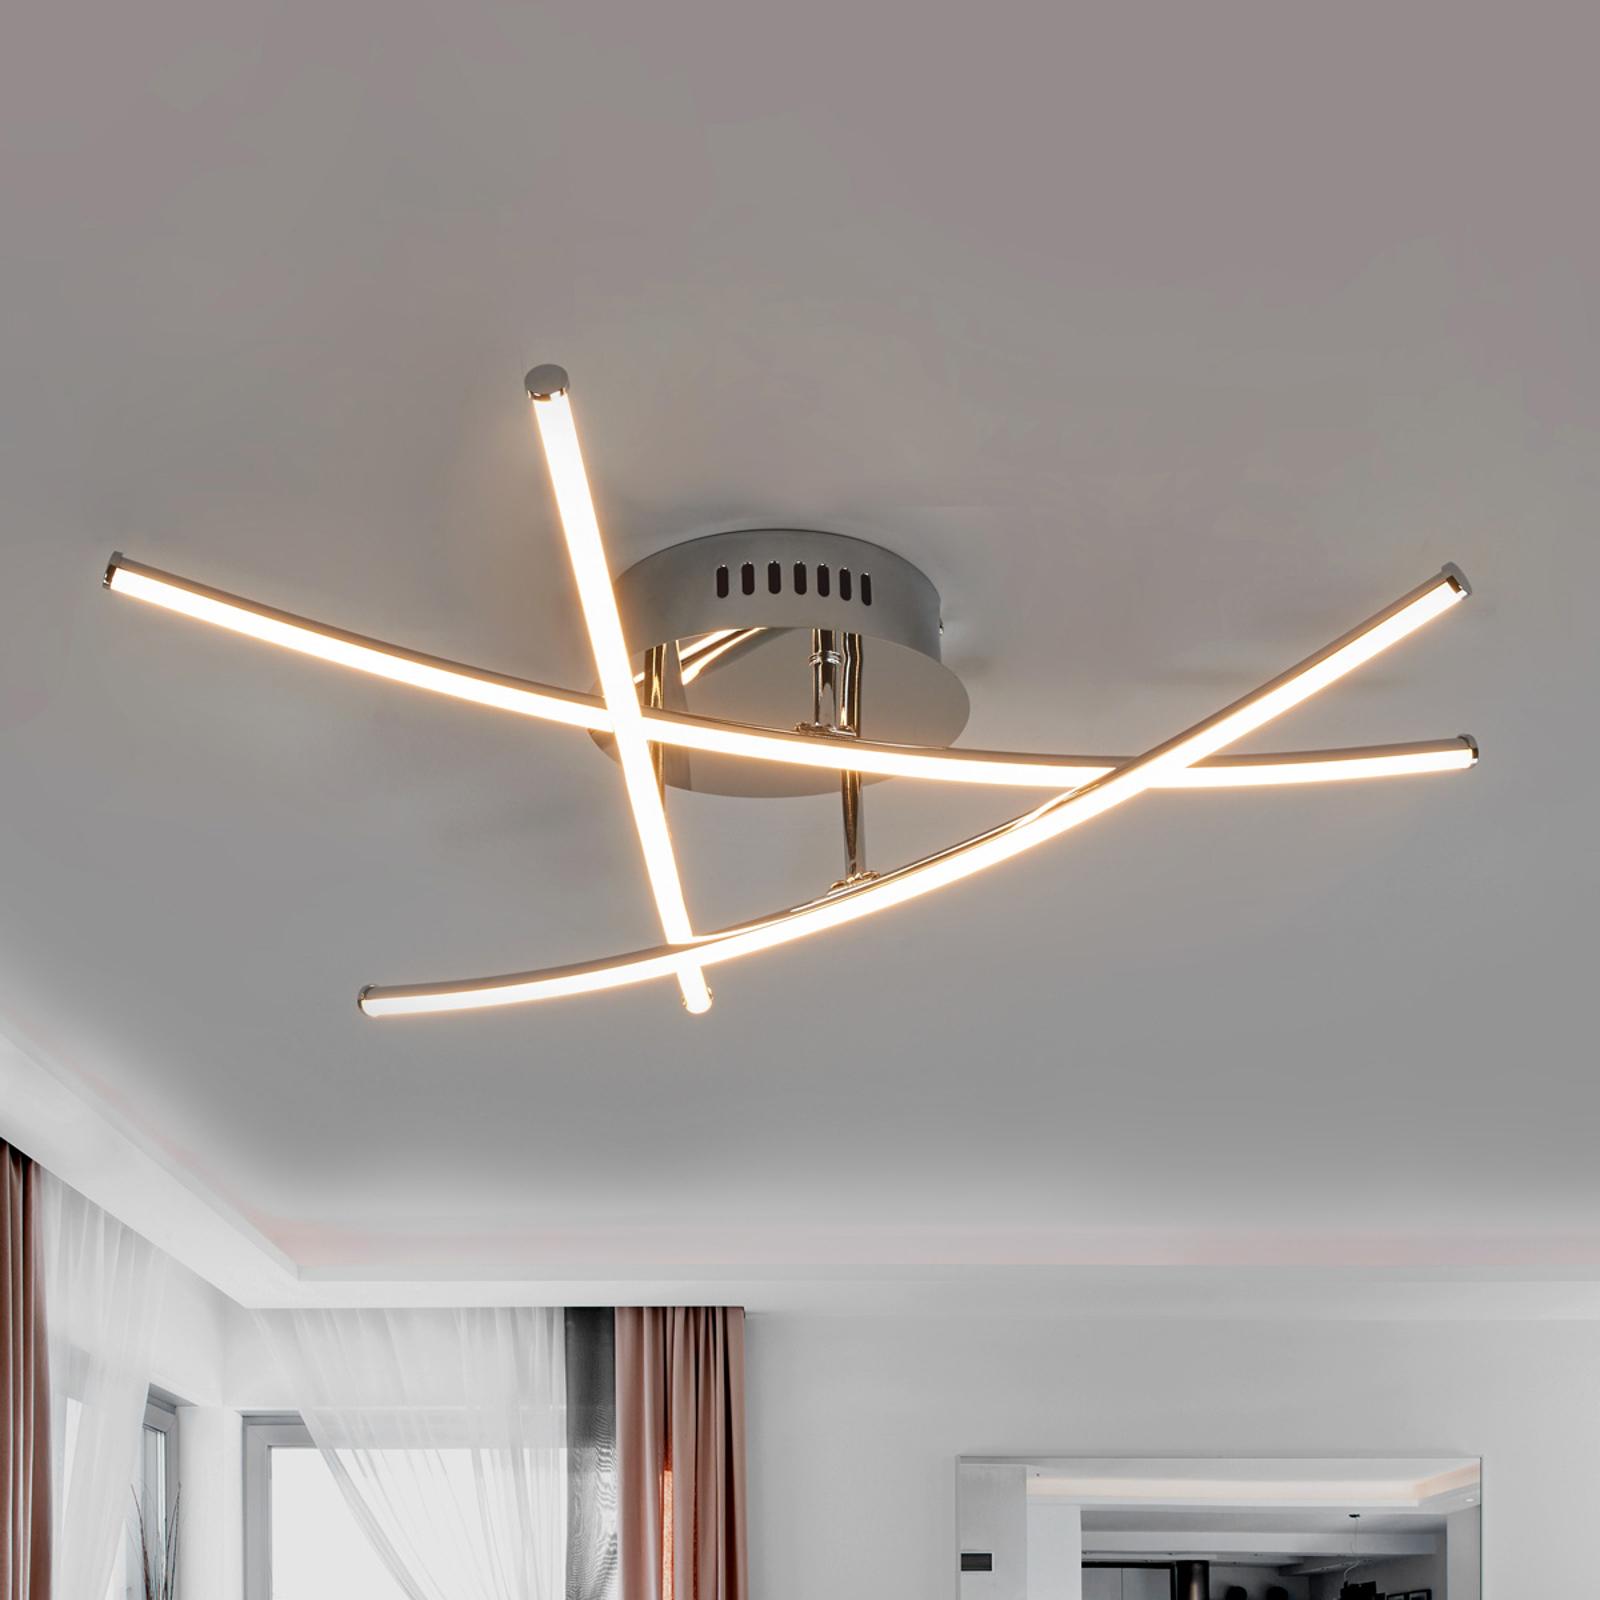 Stave over kors - flot LED-loftslampe Yael